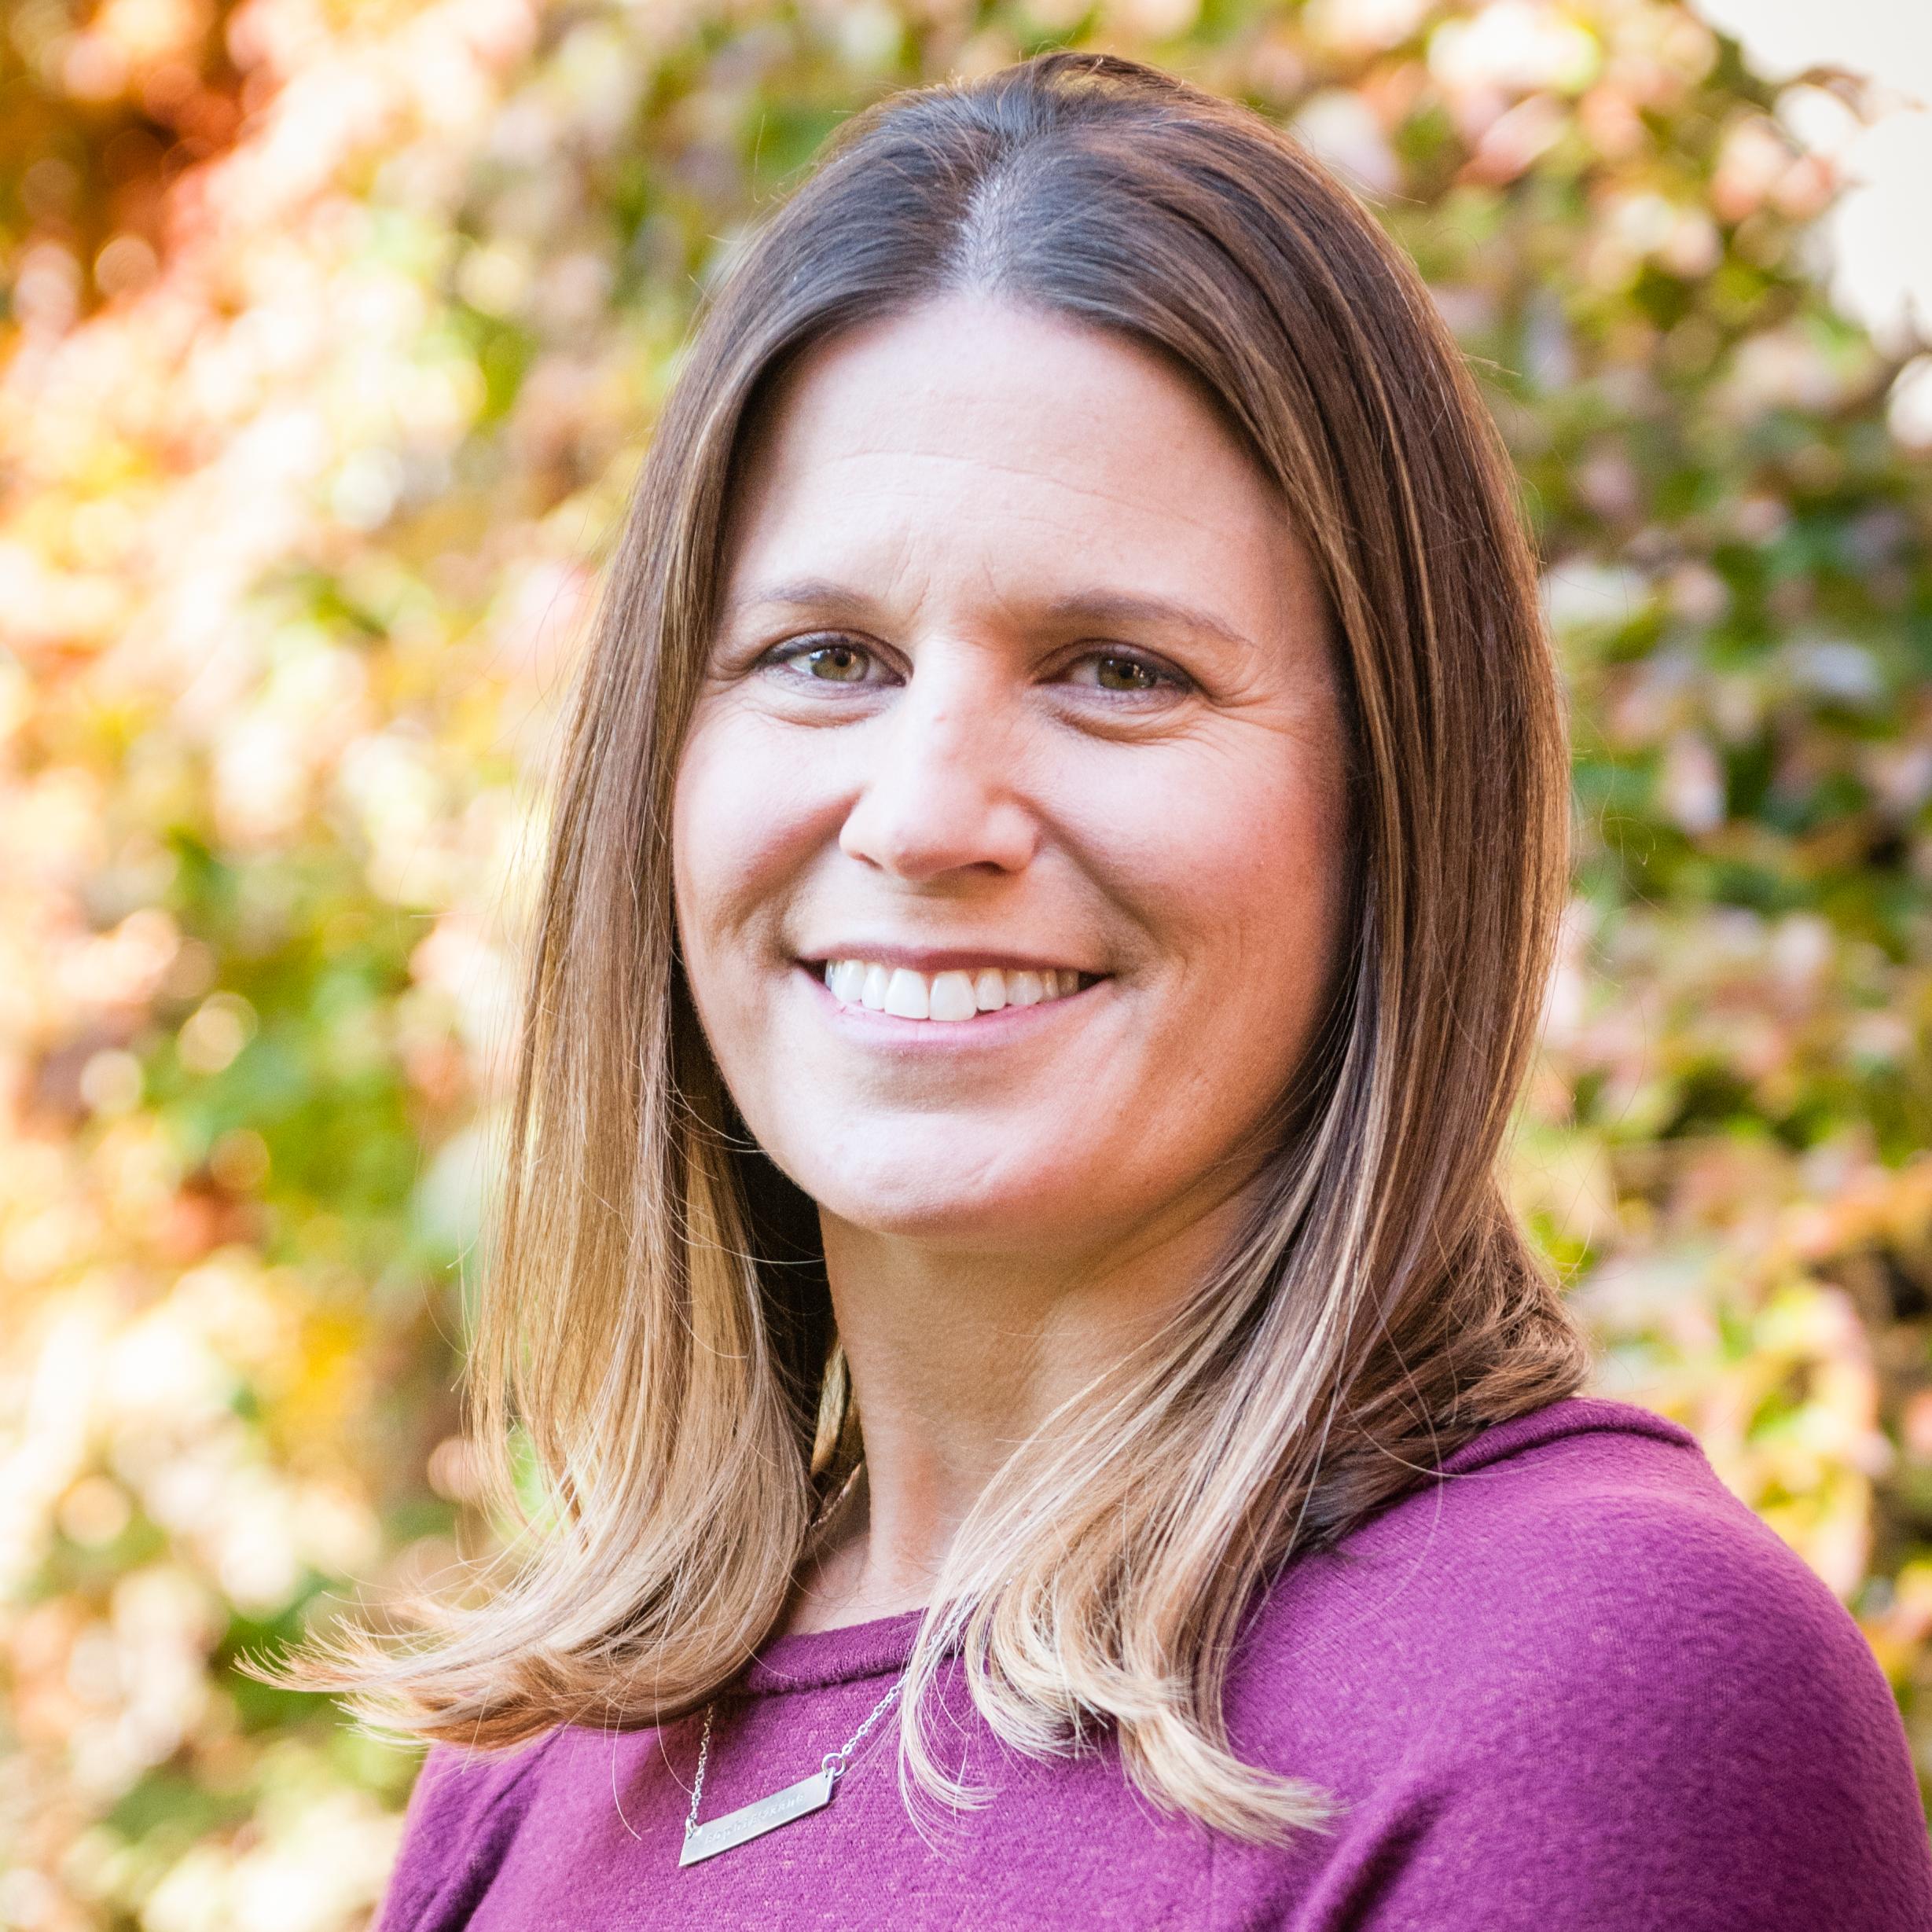 Lindsay Boudreaux - Senior Vice President, Business Development & Strategy, Saxco International